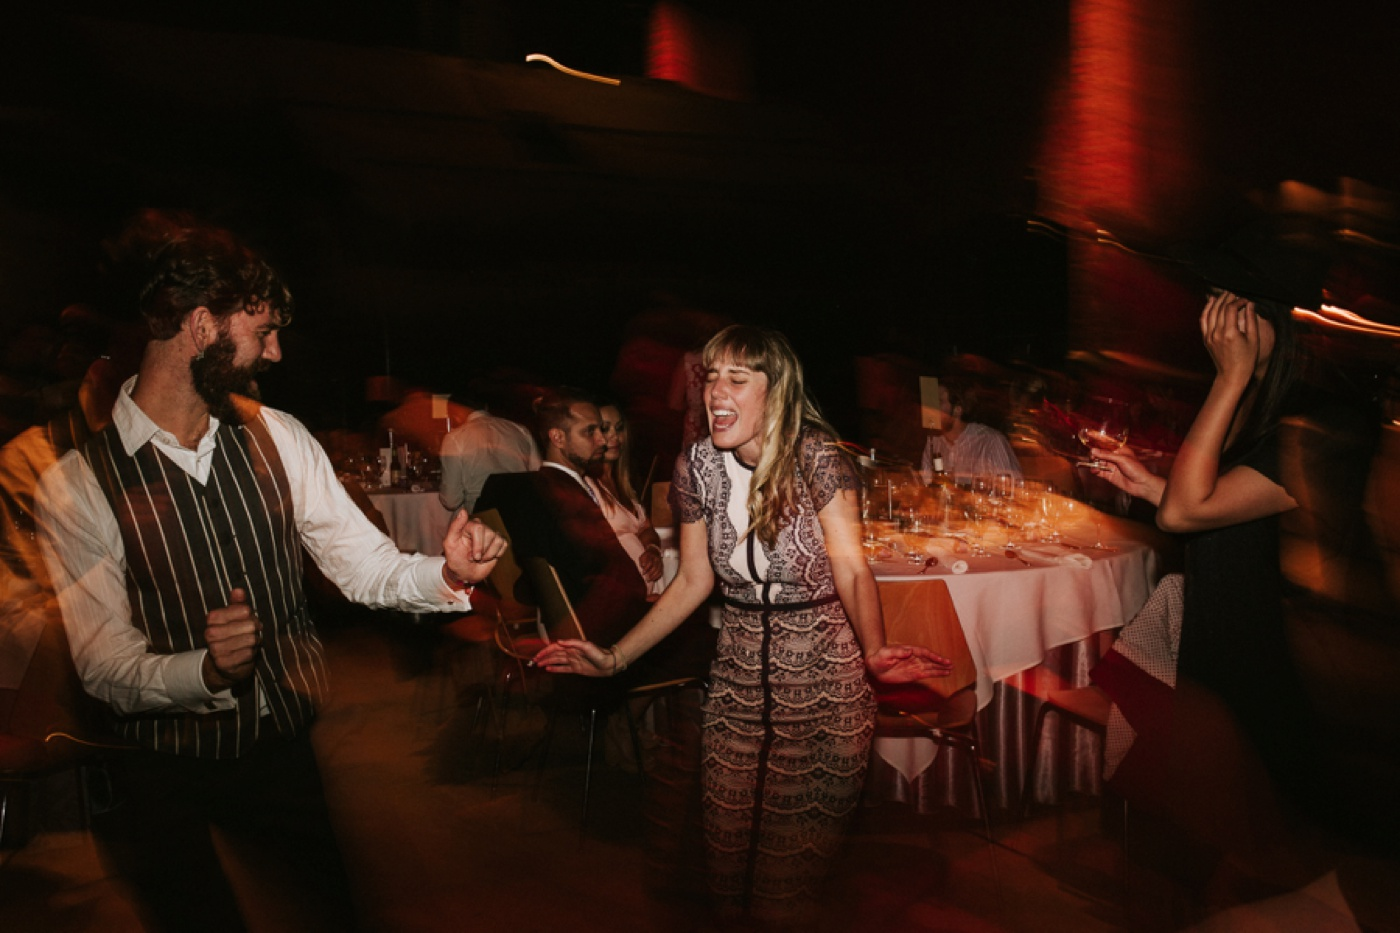 anitadaniel_melbourne-scienceworks-relaxed-fun-geek-wedding_melbourne-candid-wedding-photography_95